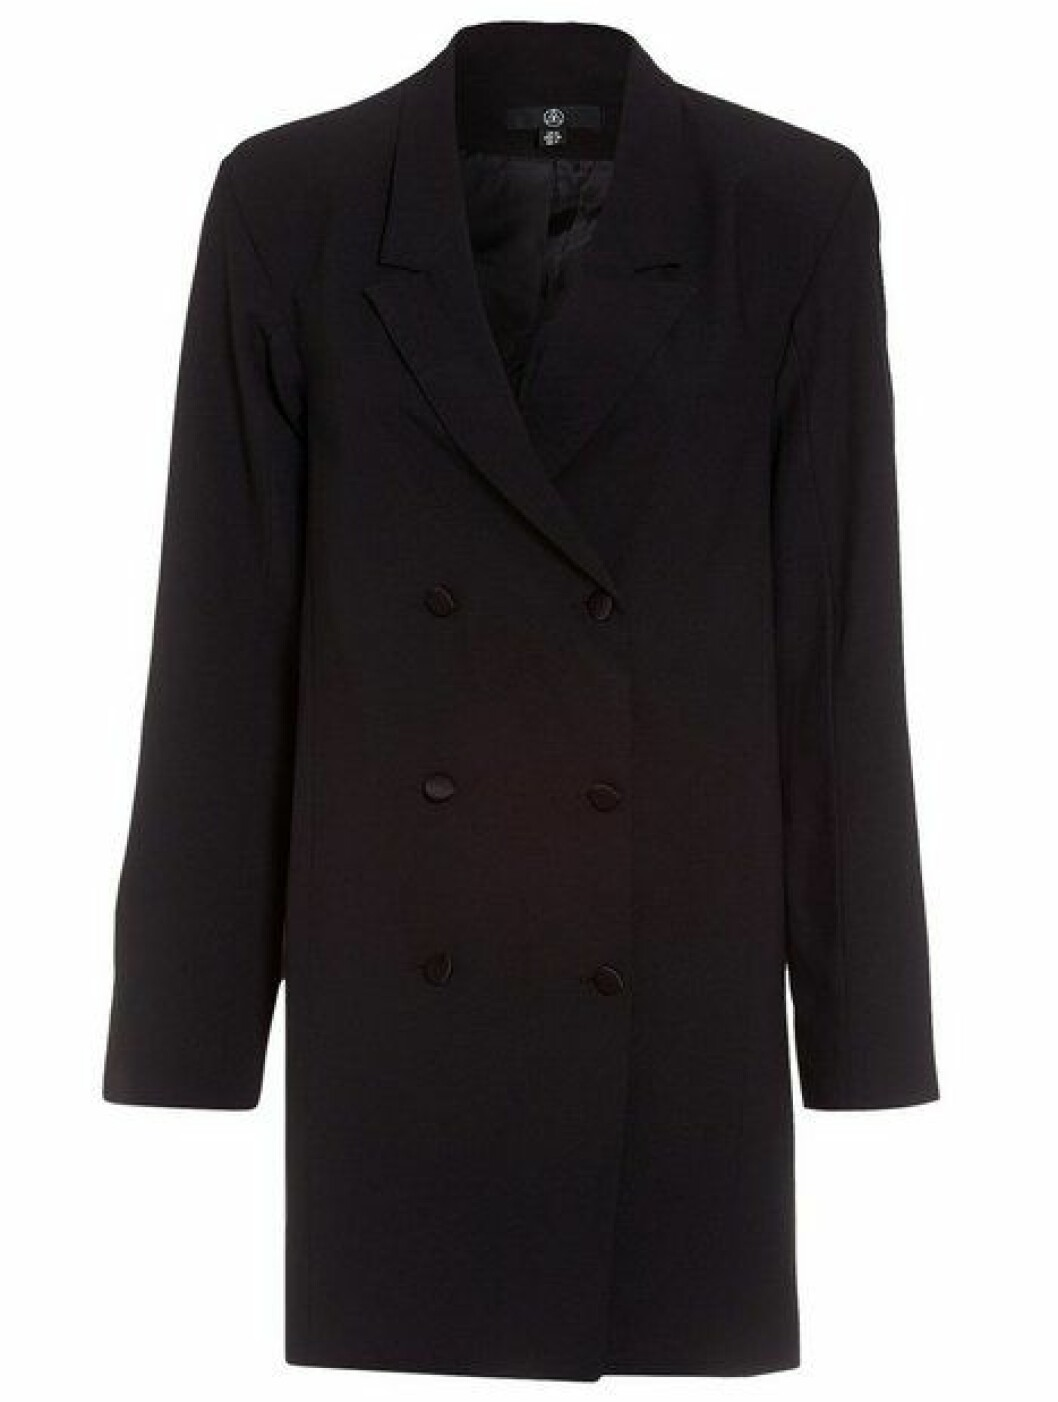 <strong>Missguided  449,-  https:</strong>//nelly.com/no/kl%C3%A6r-til-kvinner/kl%C3%A6r/festkjoler/missguided-201538/crepe-belted-button-blazer-dress-605915-0426/